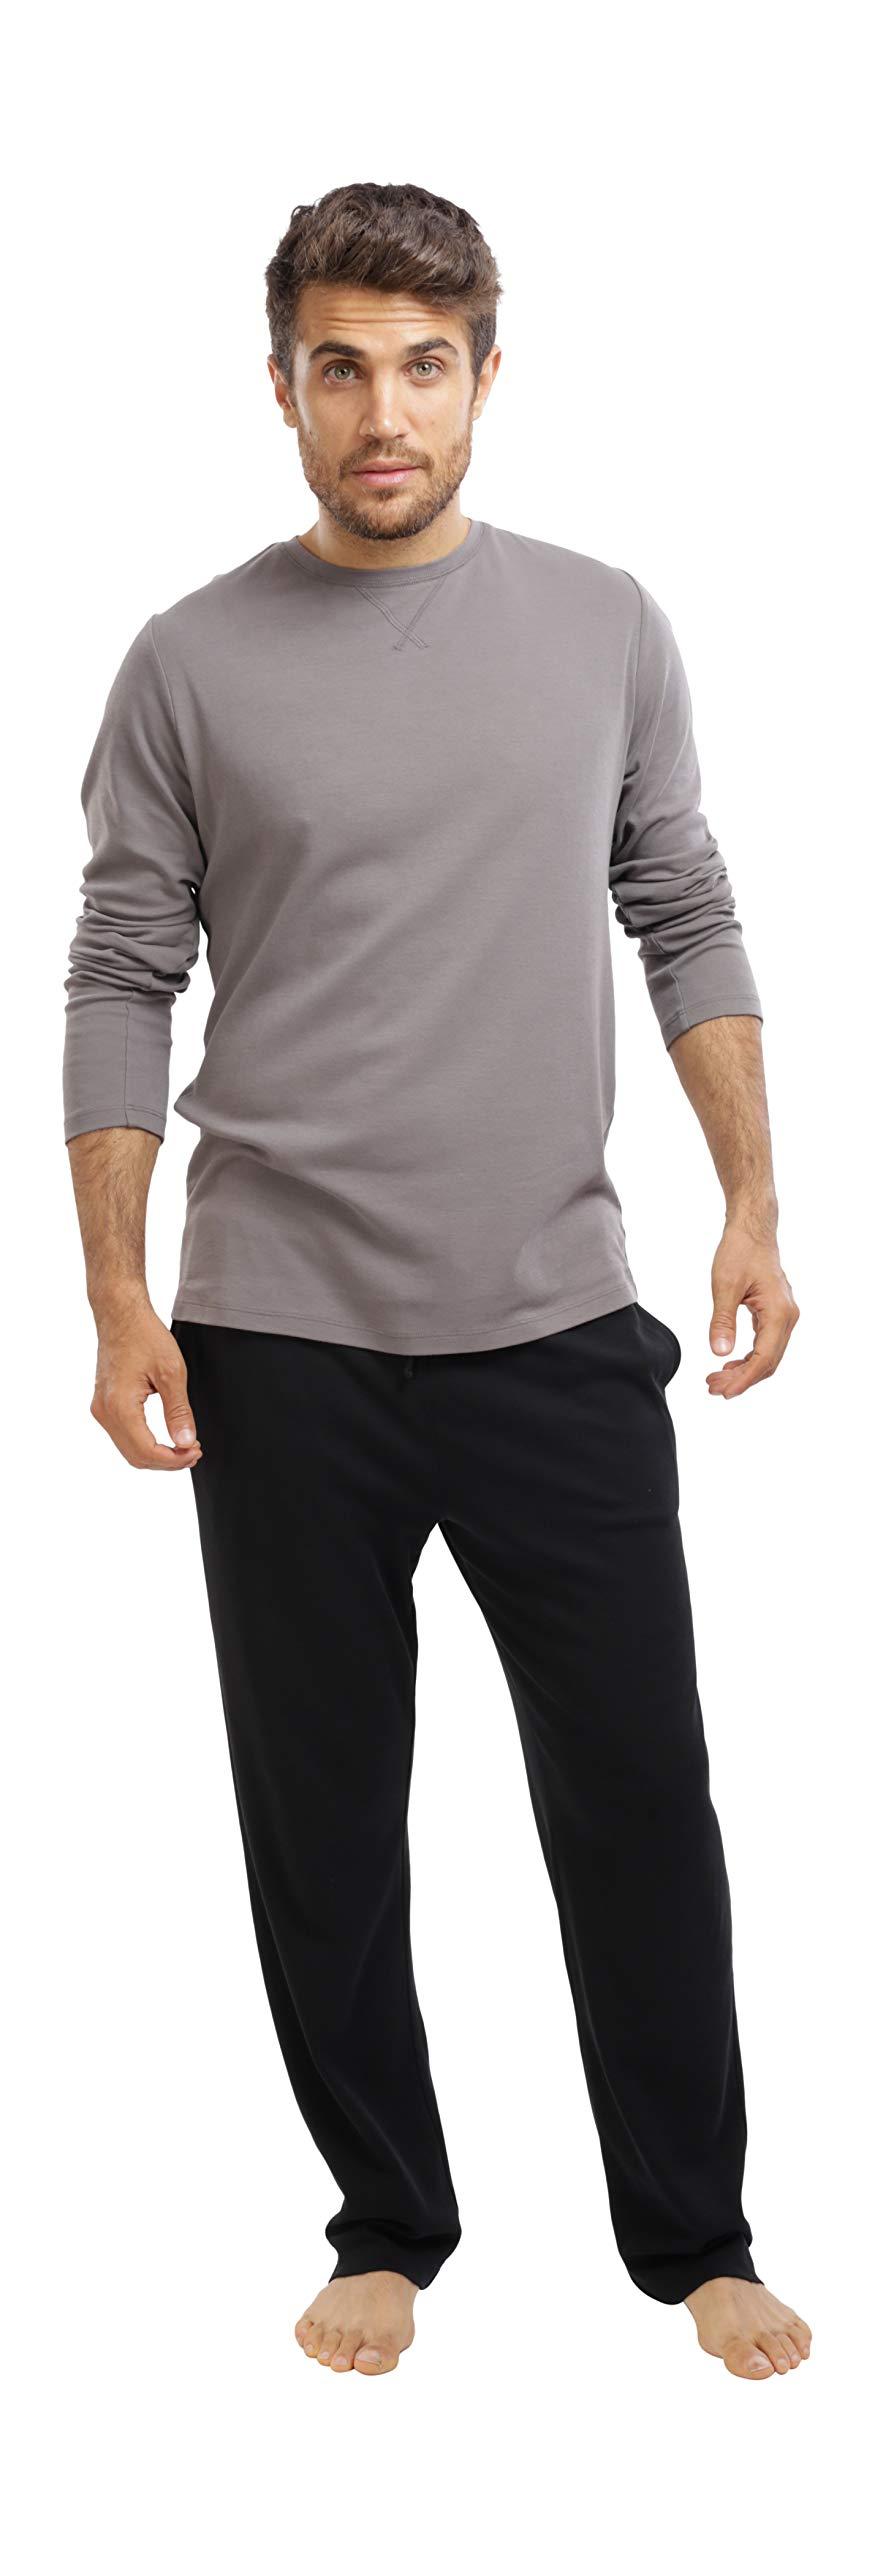 jijamas Incredibly Soft Pima Cotton Men's Pajamas Set - The Weekender in Black and Grey